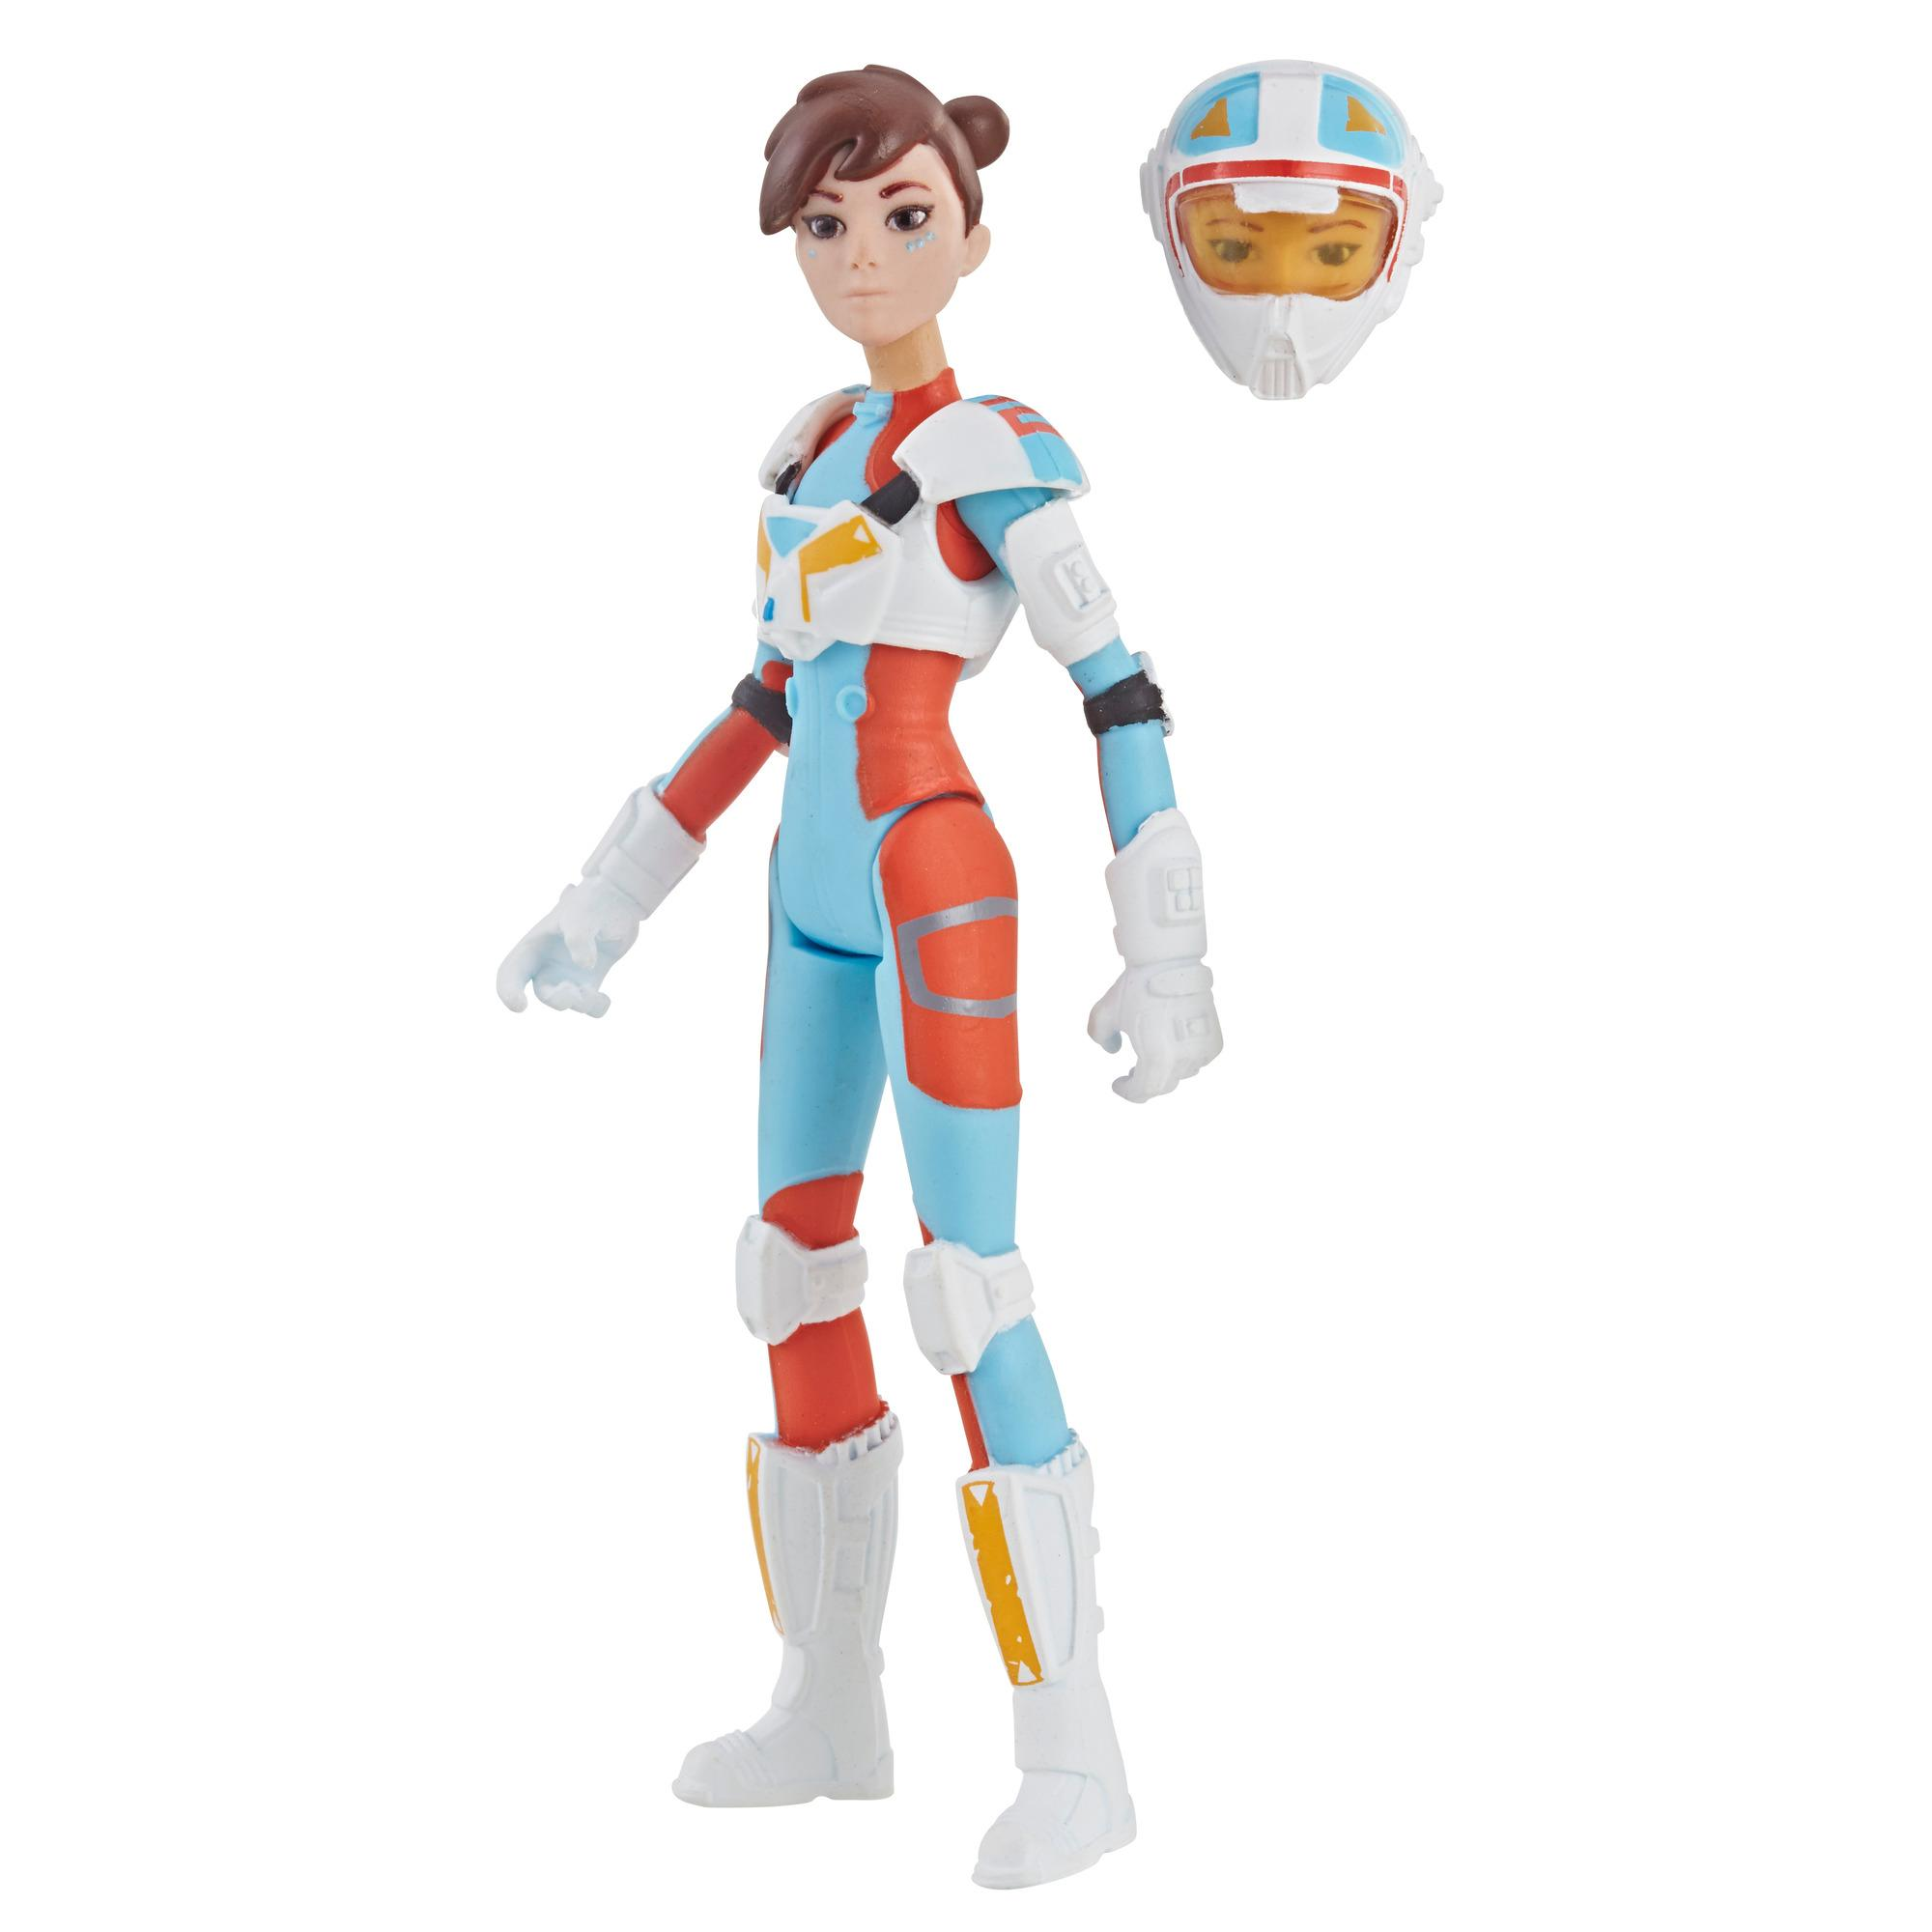 Star Wars Série animée Star Wars: Resistance - Figurine Torra Doza de 9,5 cm